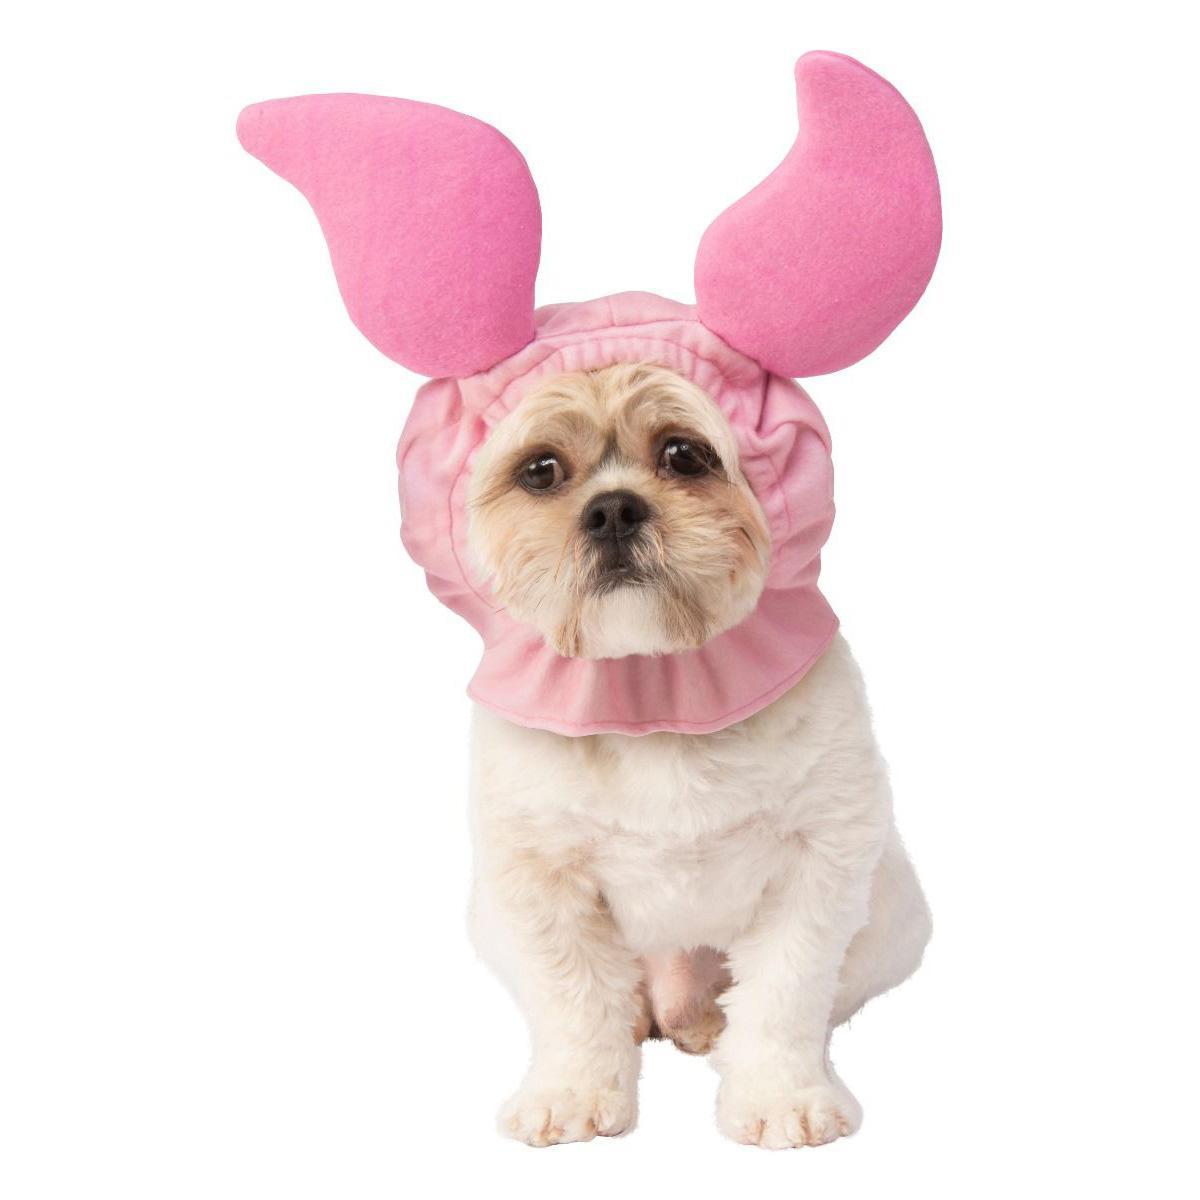 Winnie The Pooh Piglet Headpiece Dog Costume